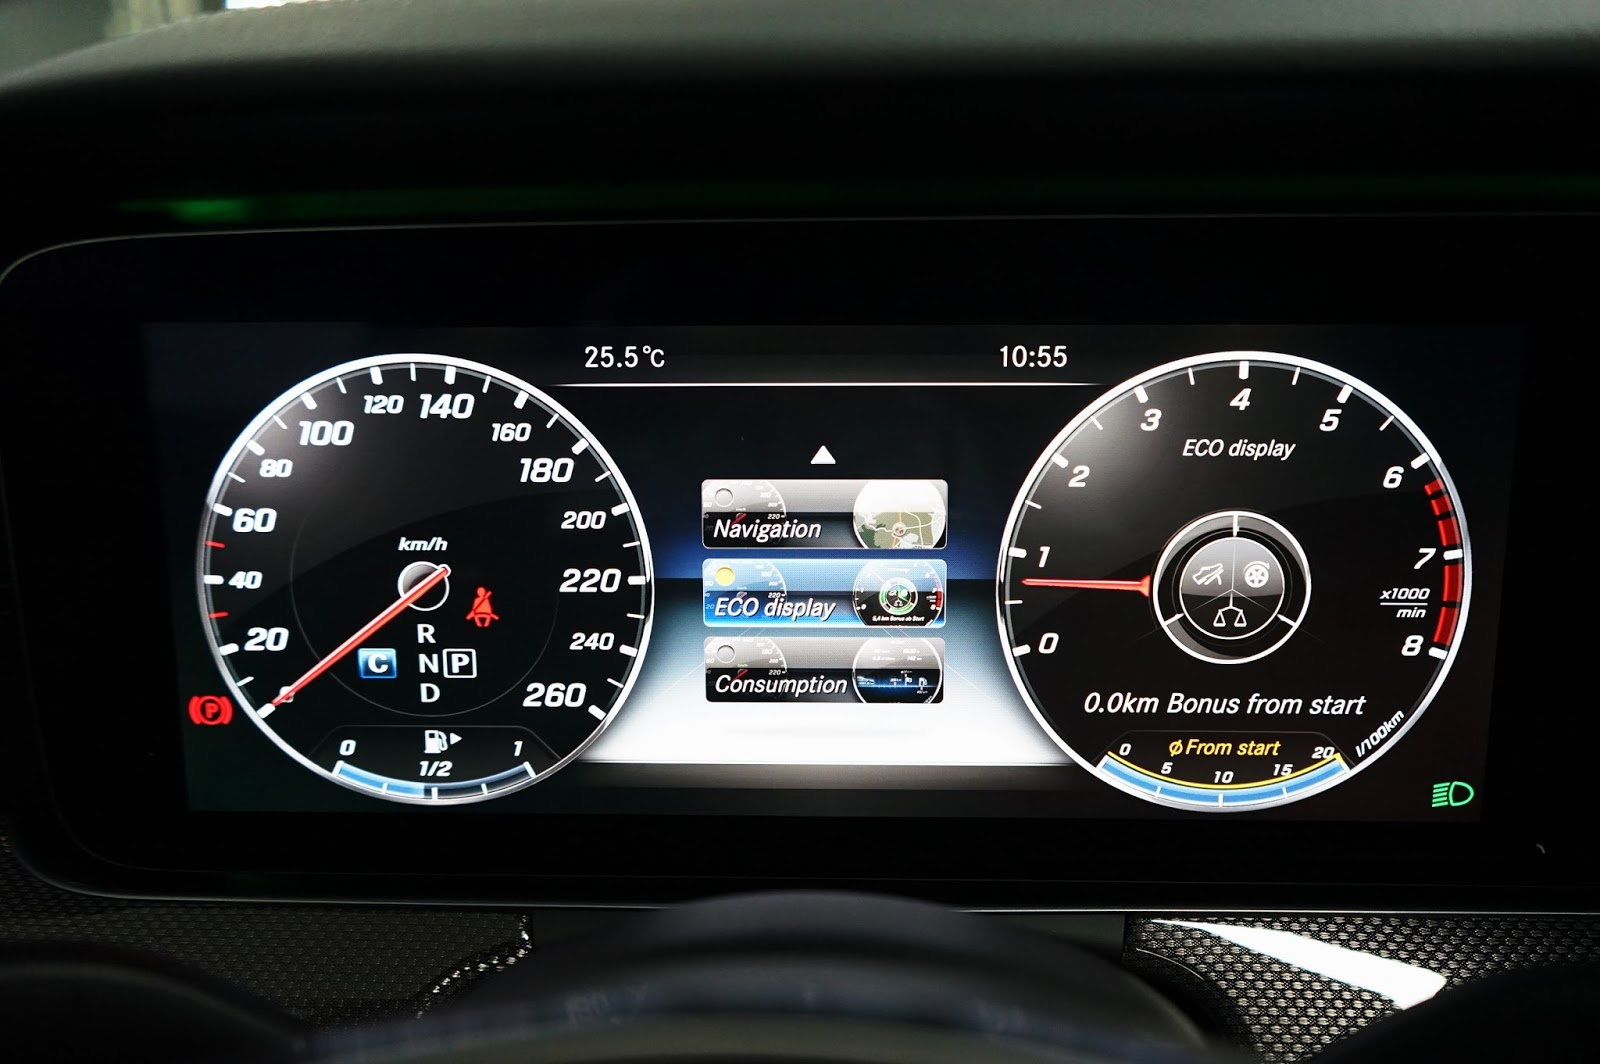 xe Mercedes Benz E400 thế hệ mới 09